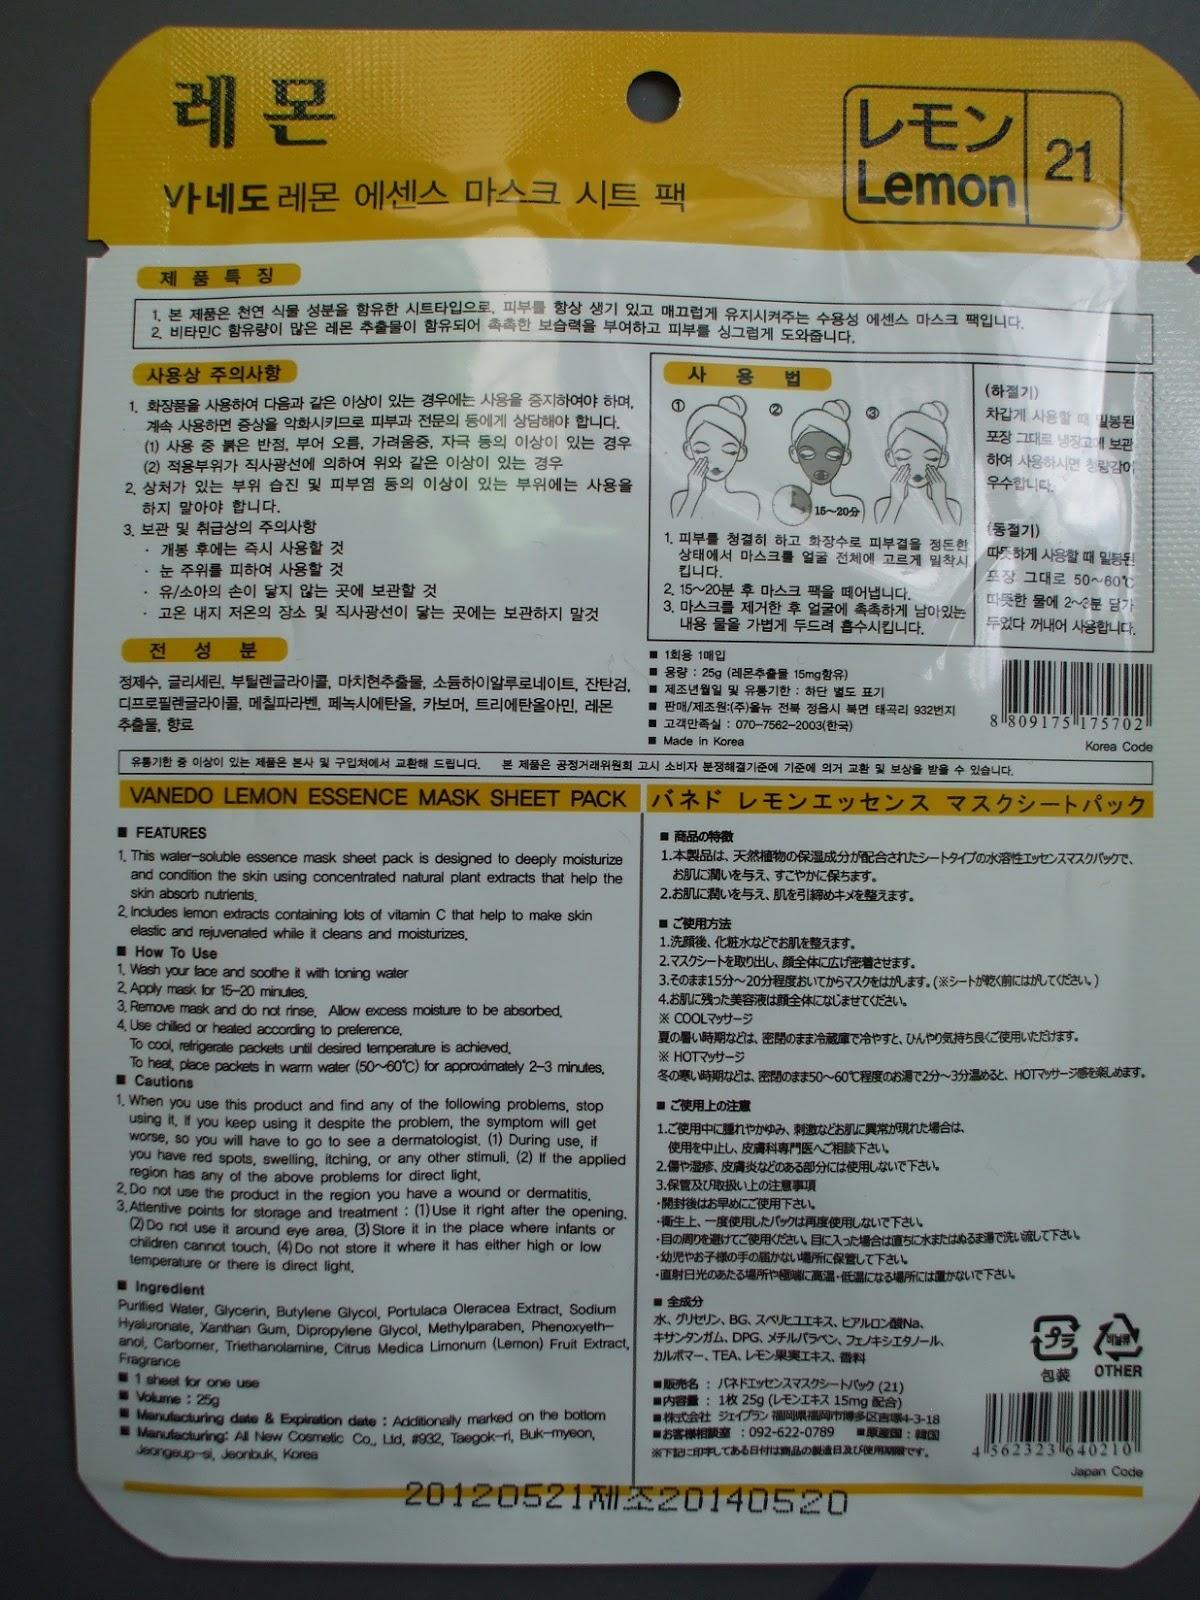 Vanedo Beauty Friends Sheet Mask lemon ingredients